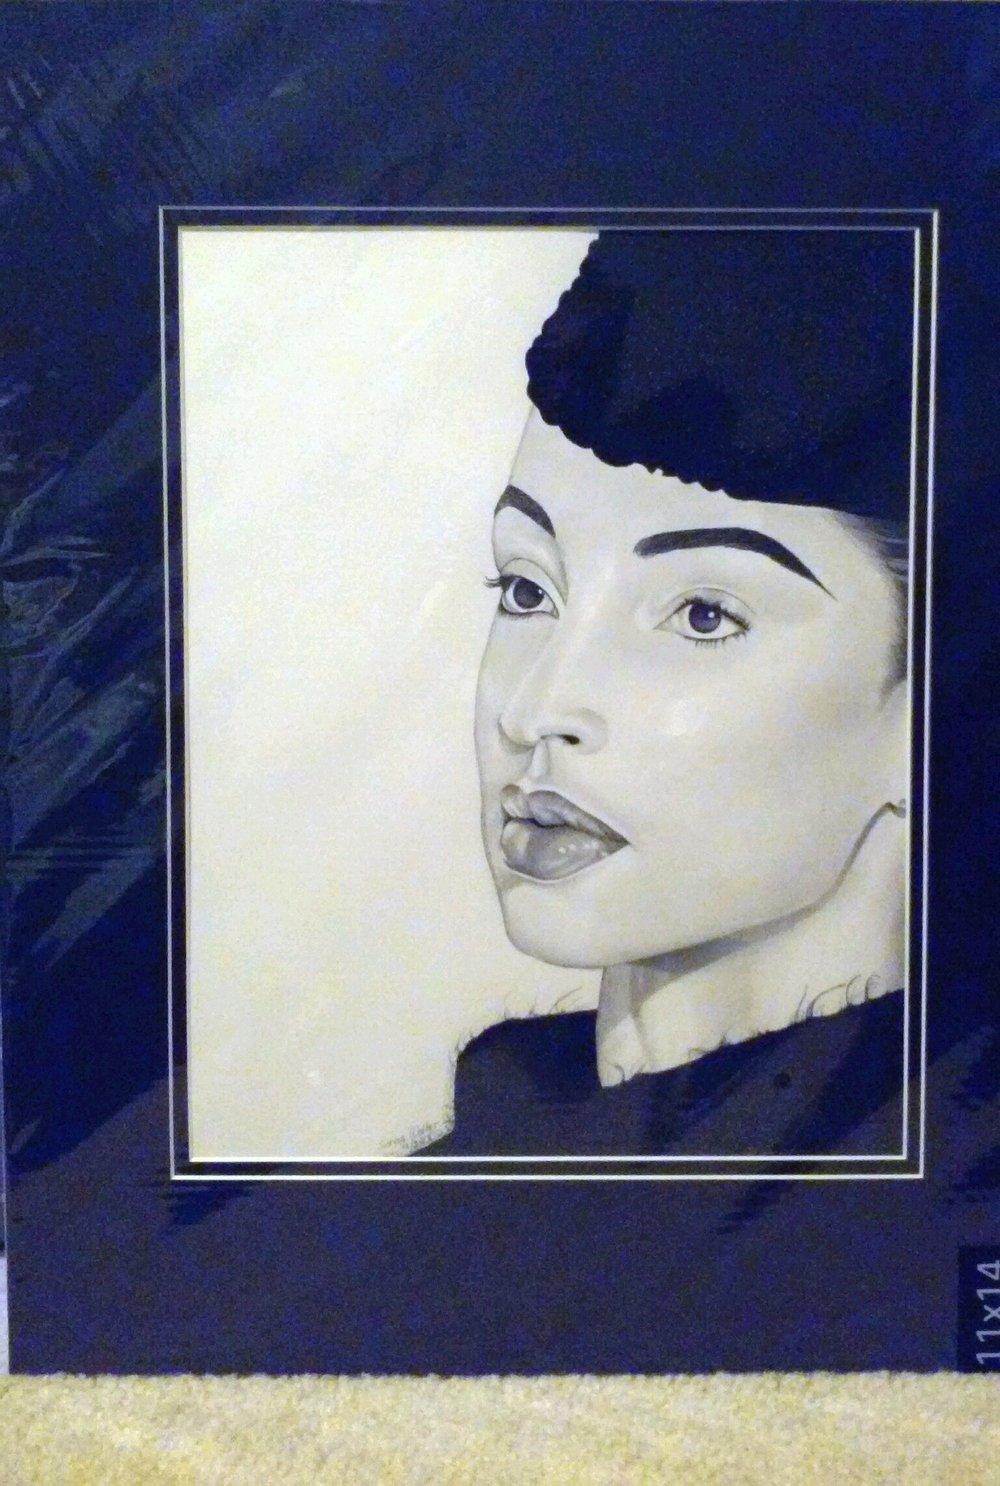 Matted Original Sade Drawing